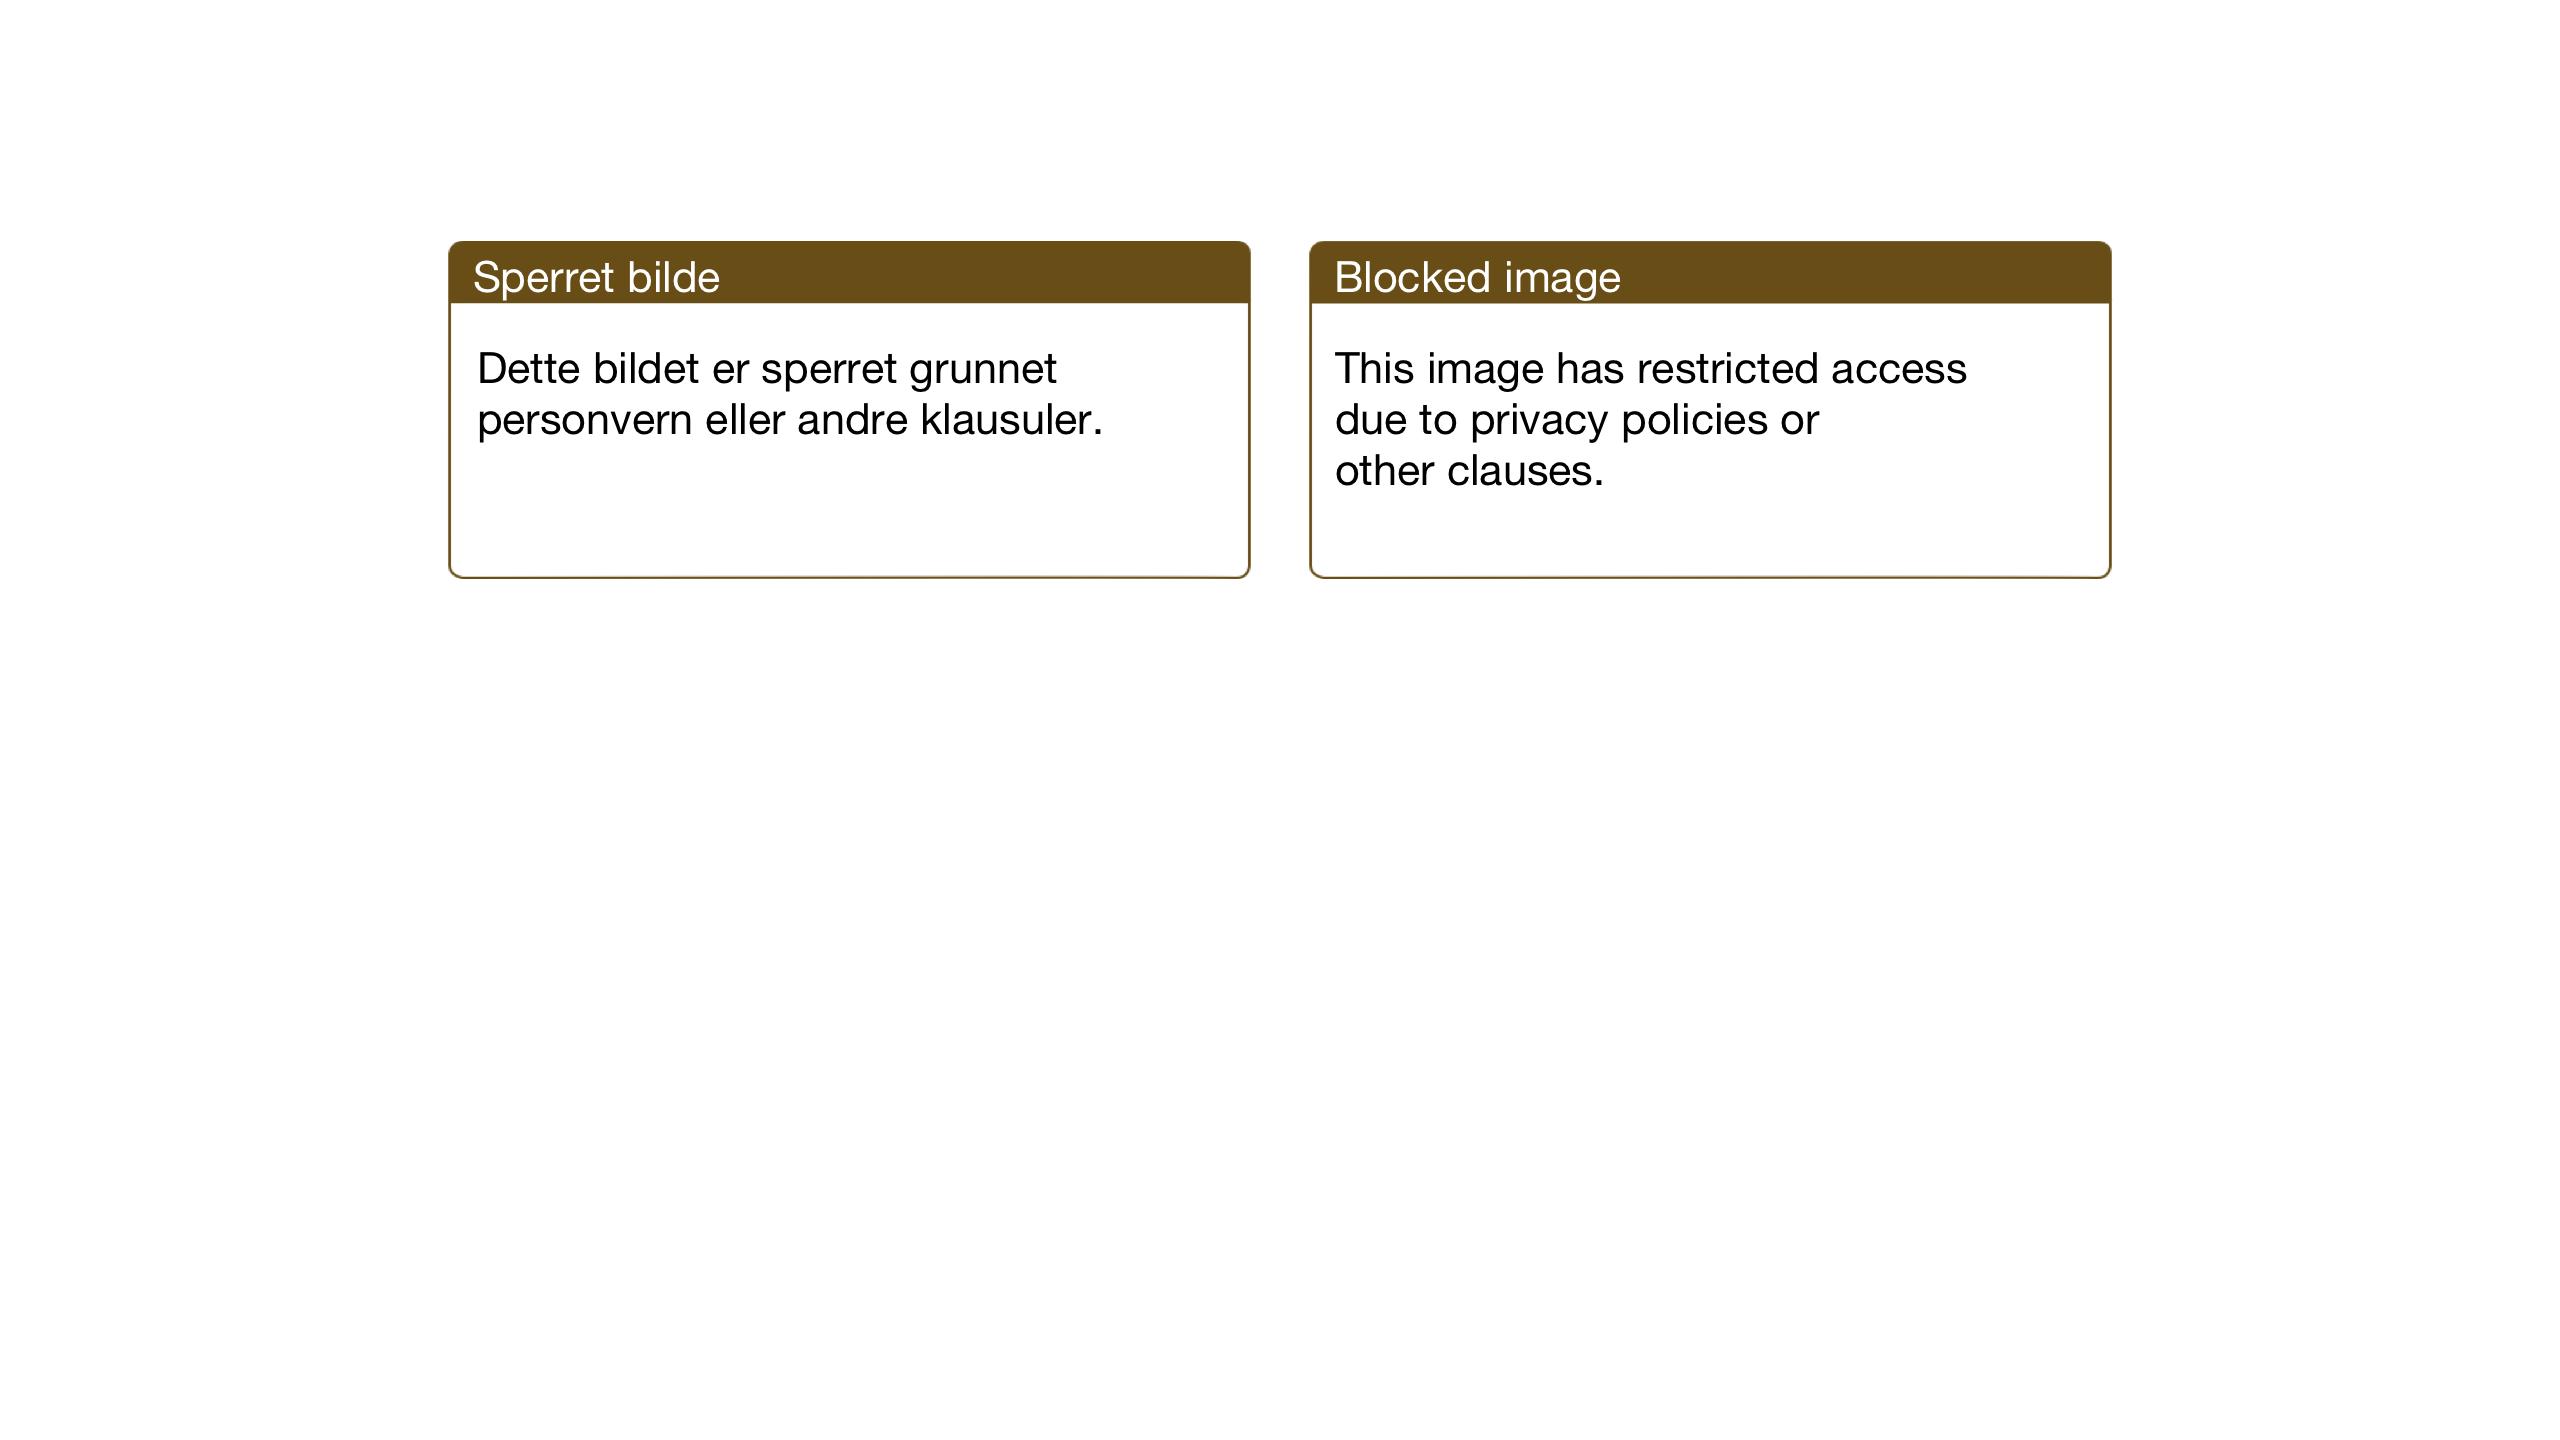 SAT, Ministerialprotokoller, klokkerbøker og fødselsregistre - Nordland, 847/L0680: Klokkerbok nr. 847C08, 1930-1947, s. 51